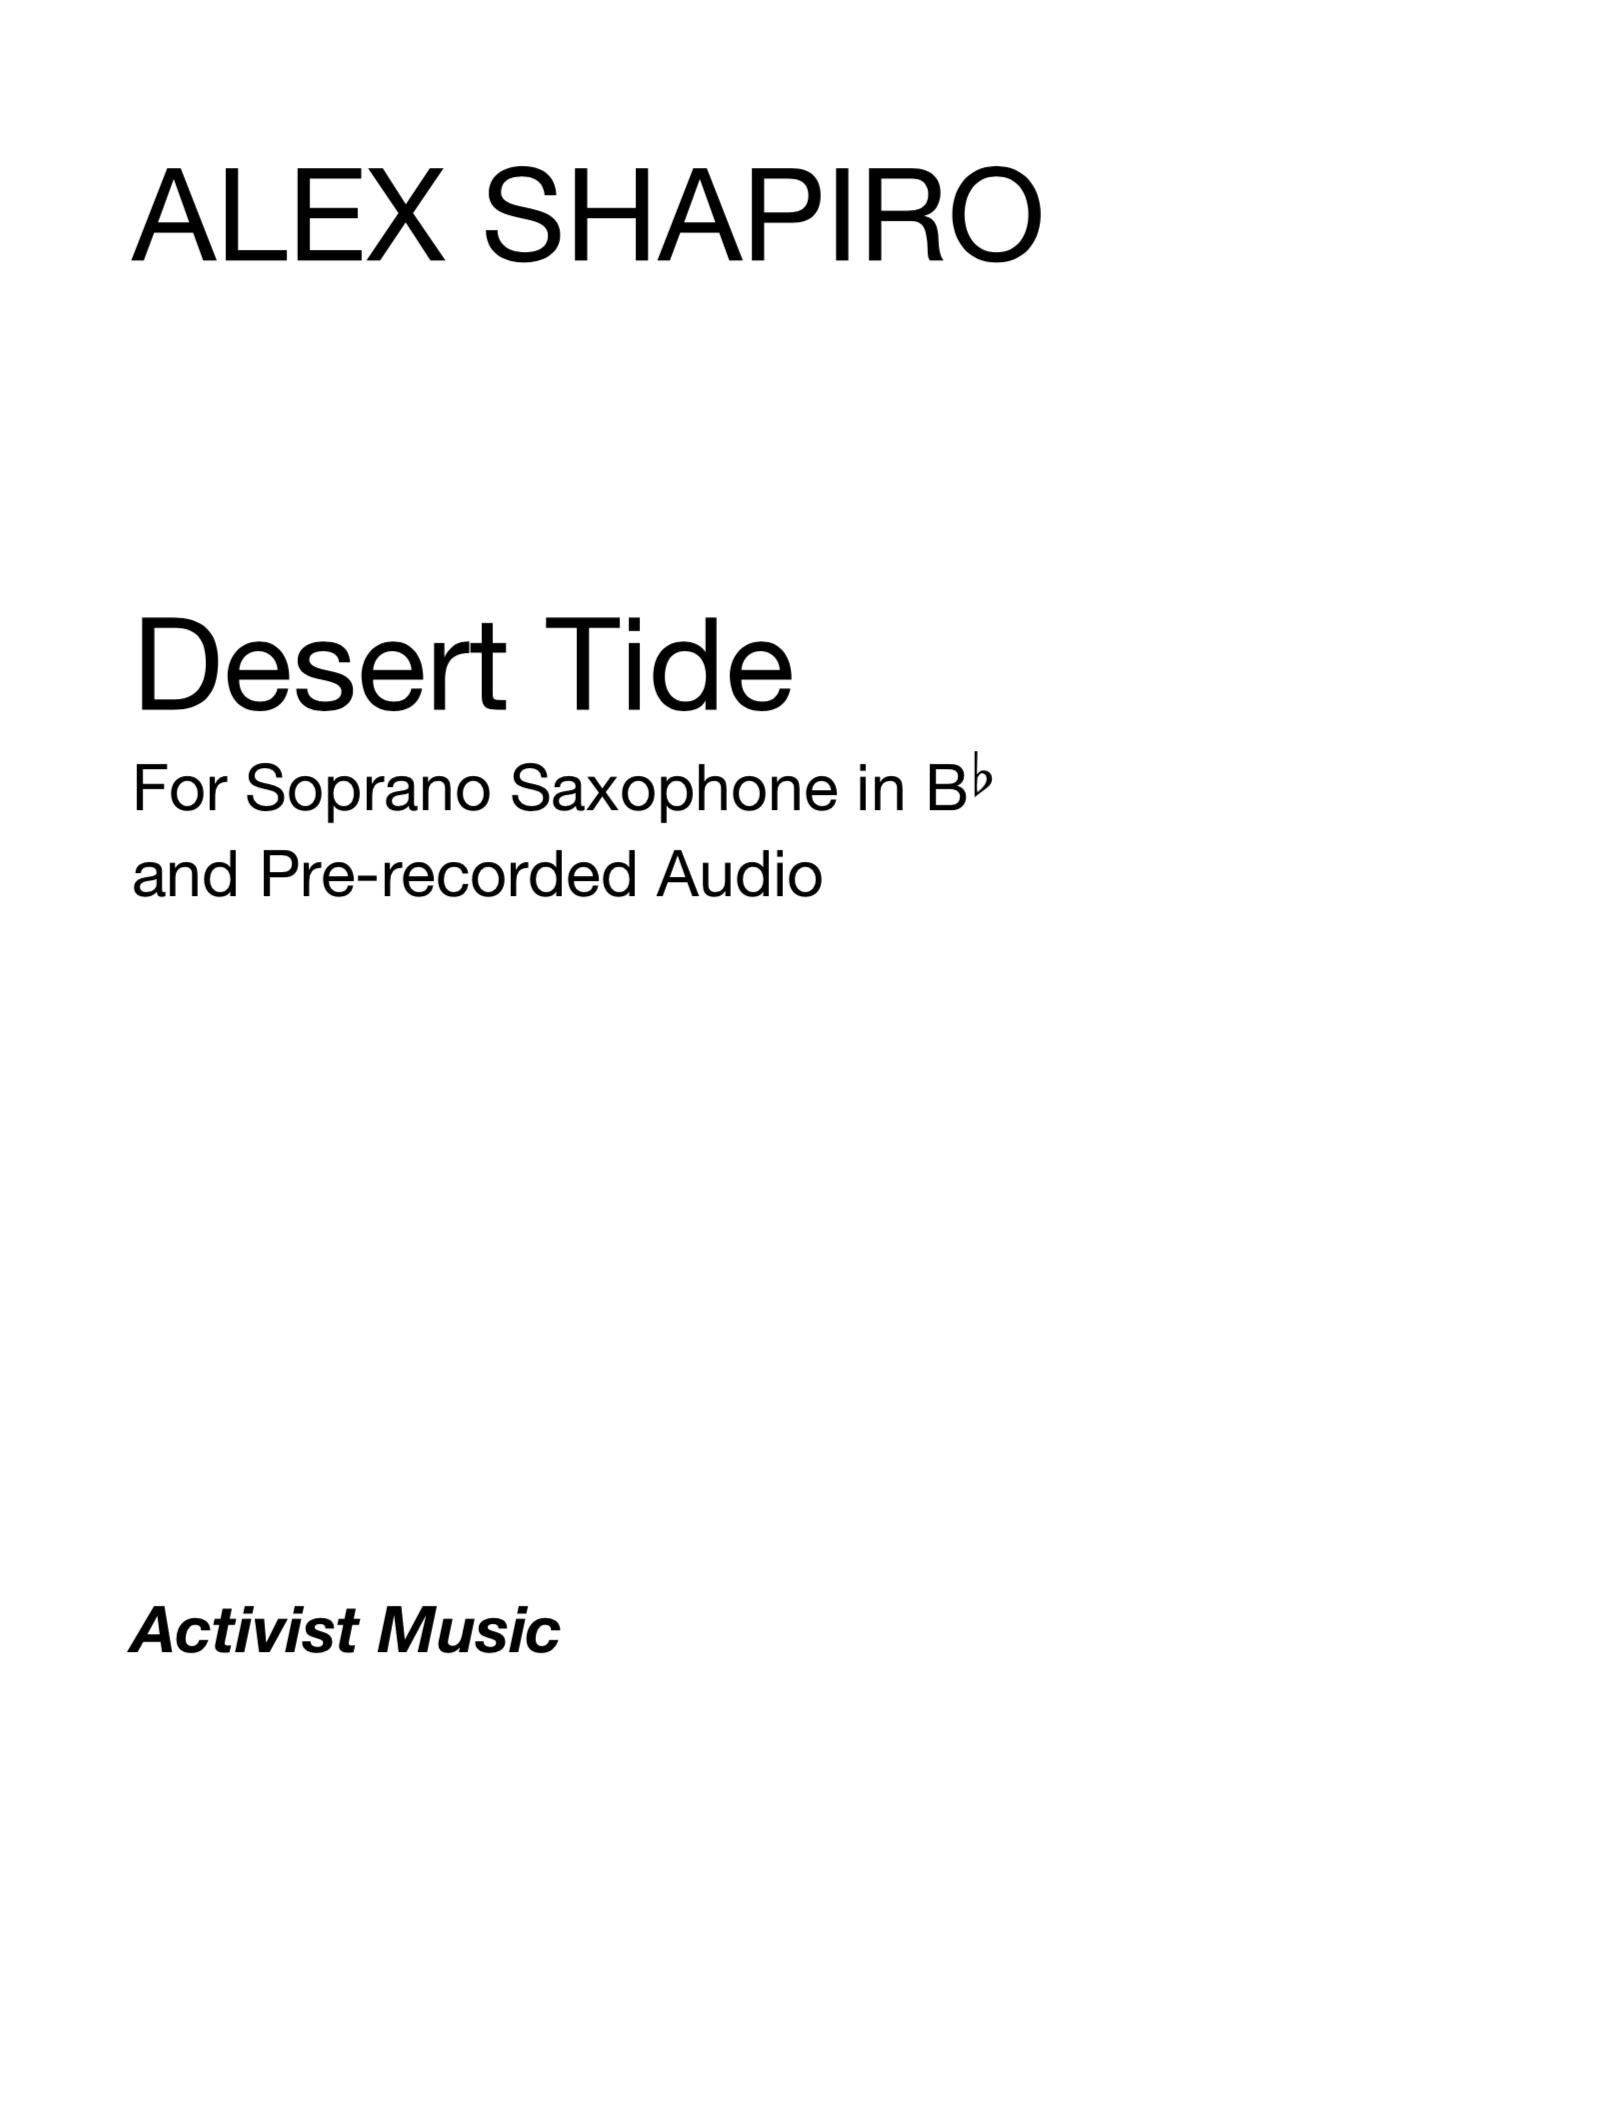 Desert Tide by Alex Shapiro